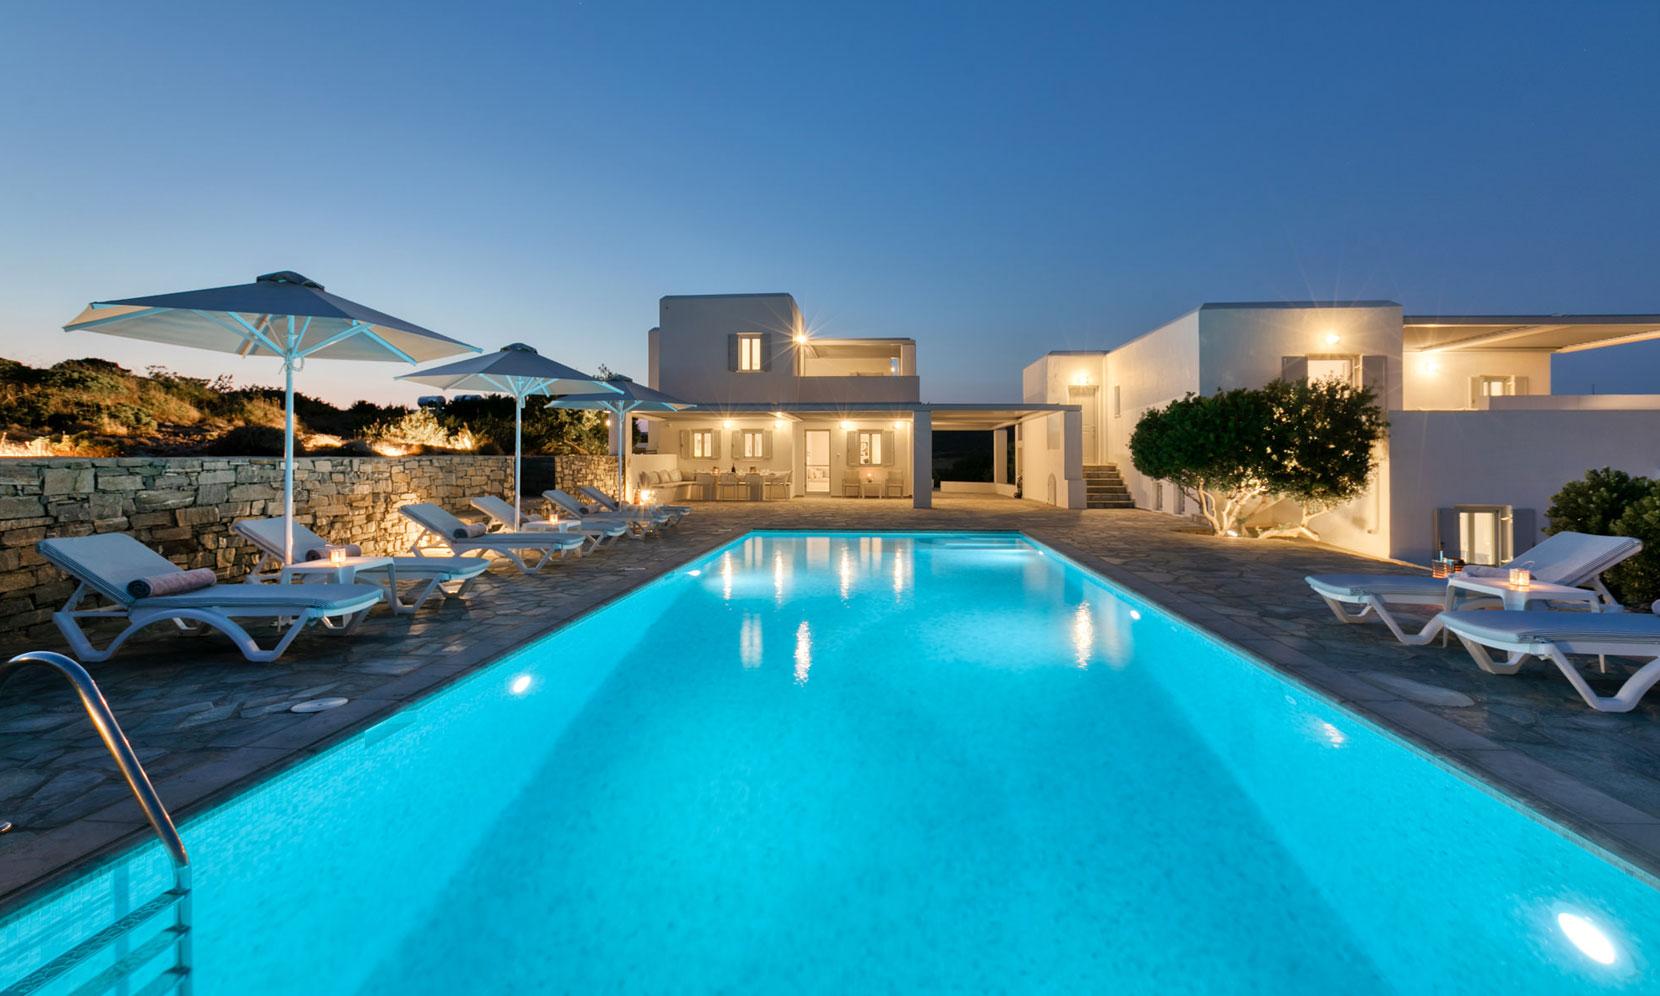 Paros Villa Adria jumbotron image